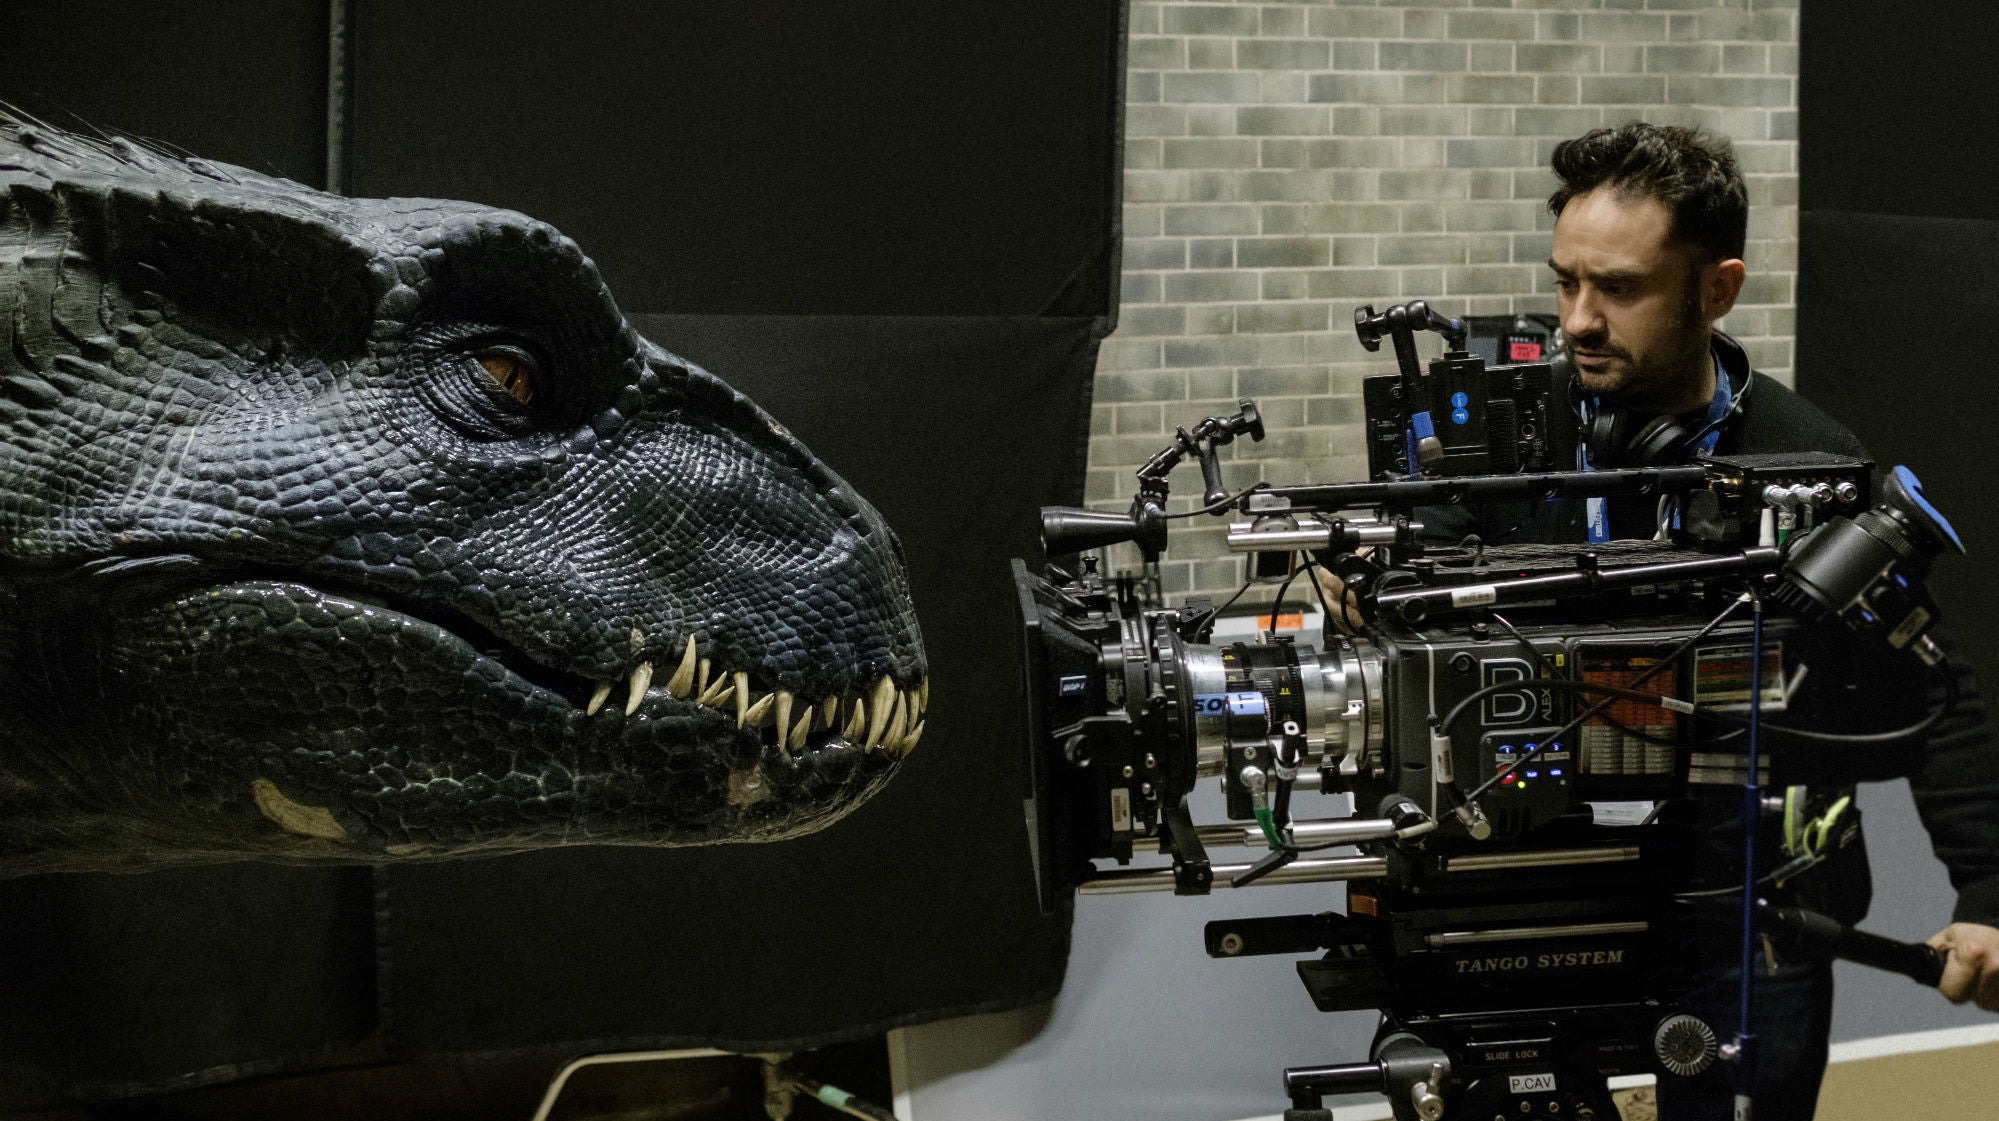 How Director J.A. Bayona Made Jurassic World: Fallen Kingdom All His Own